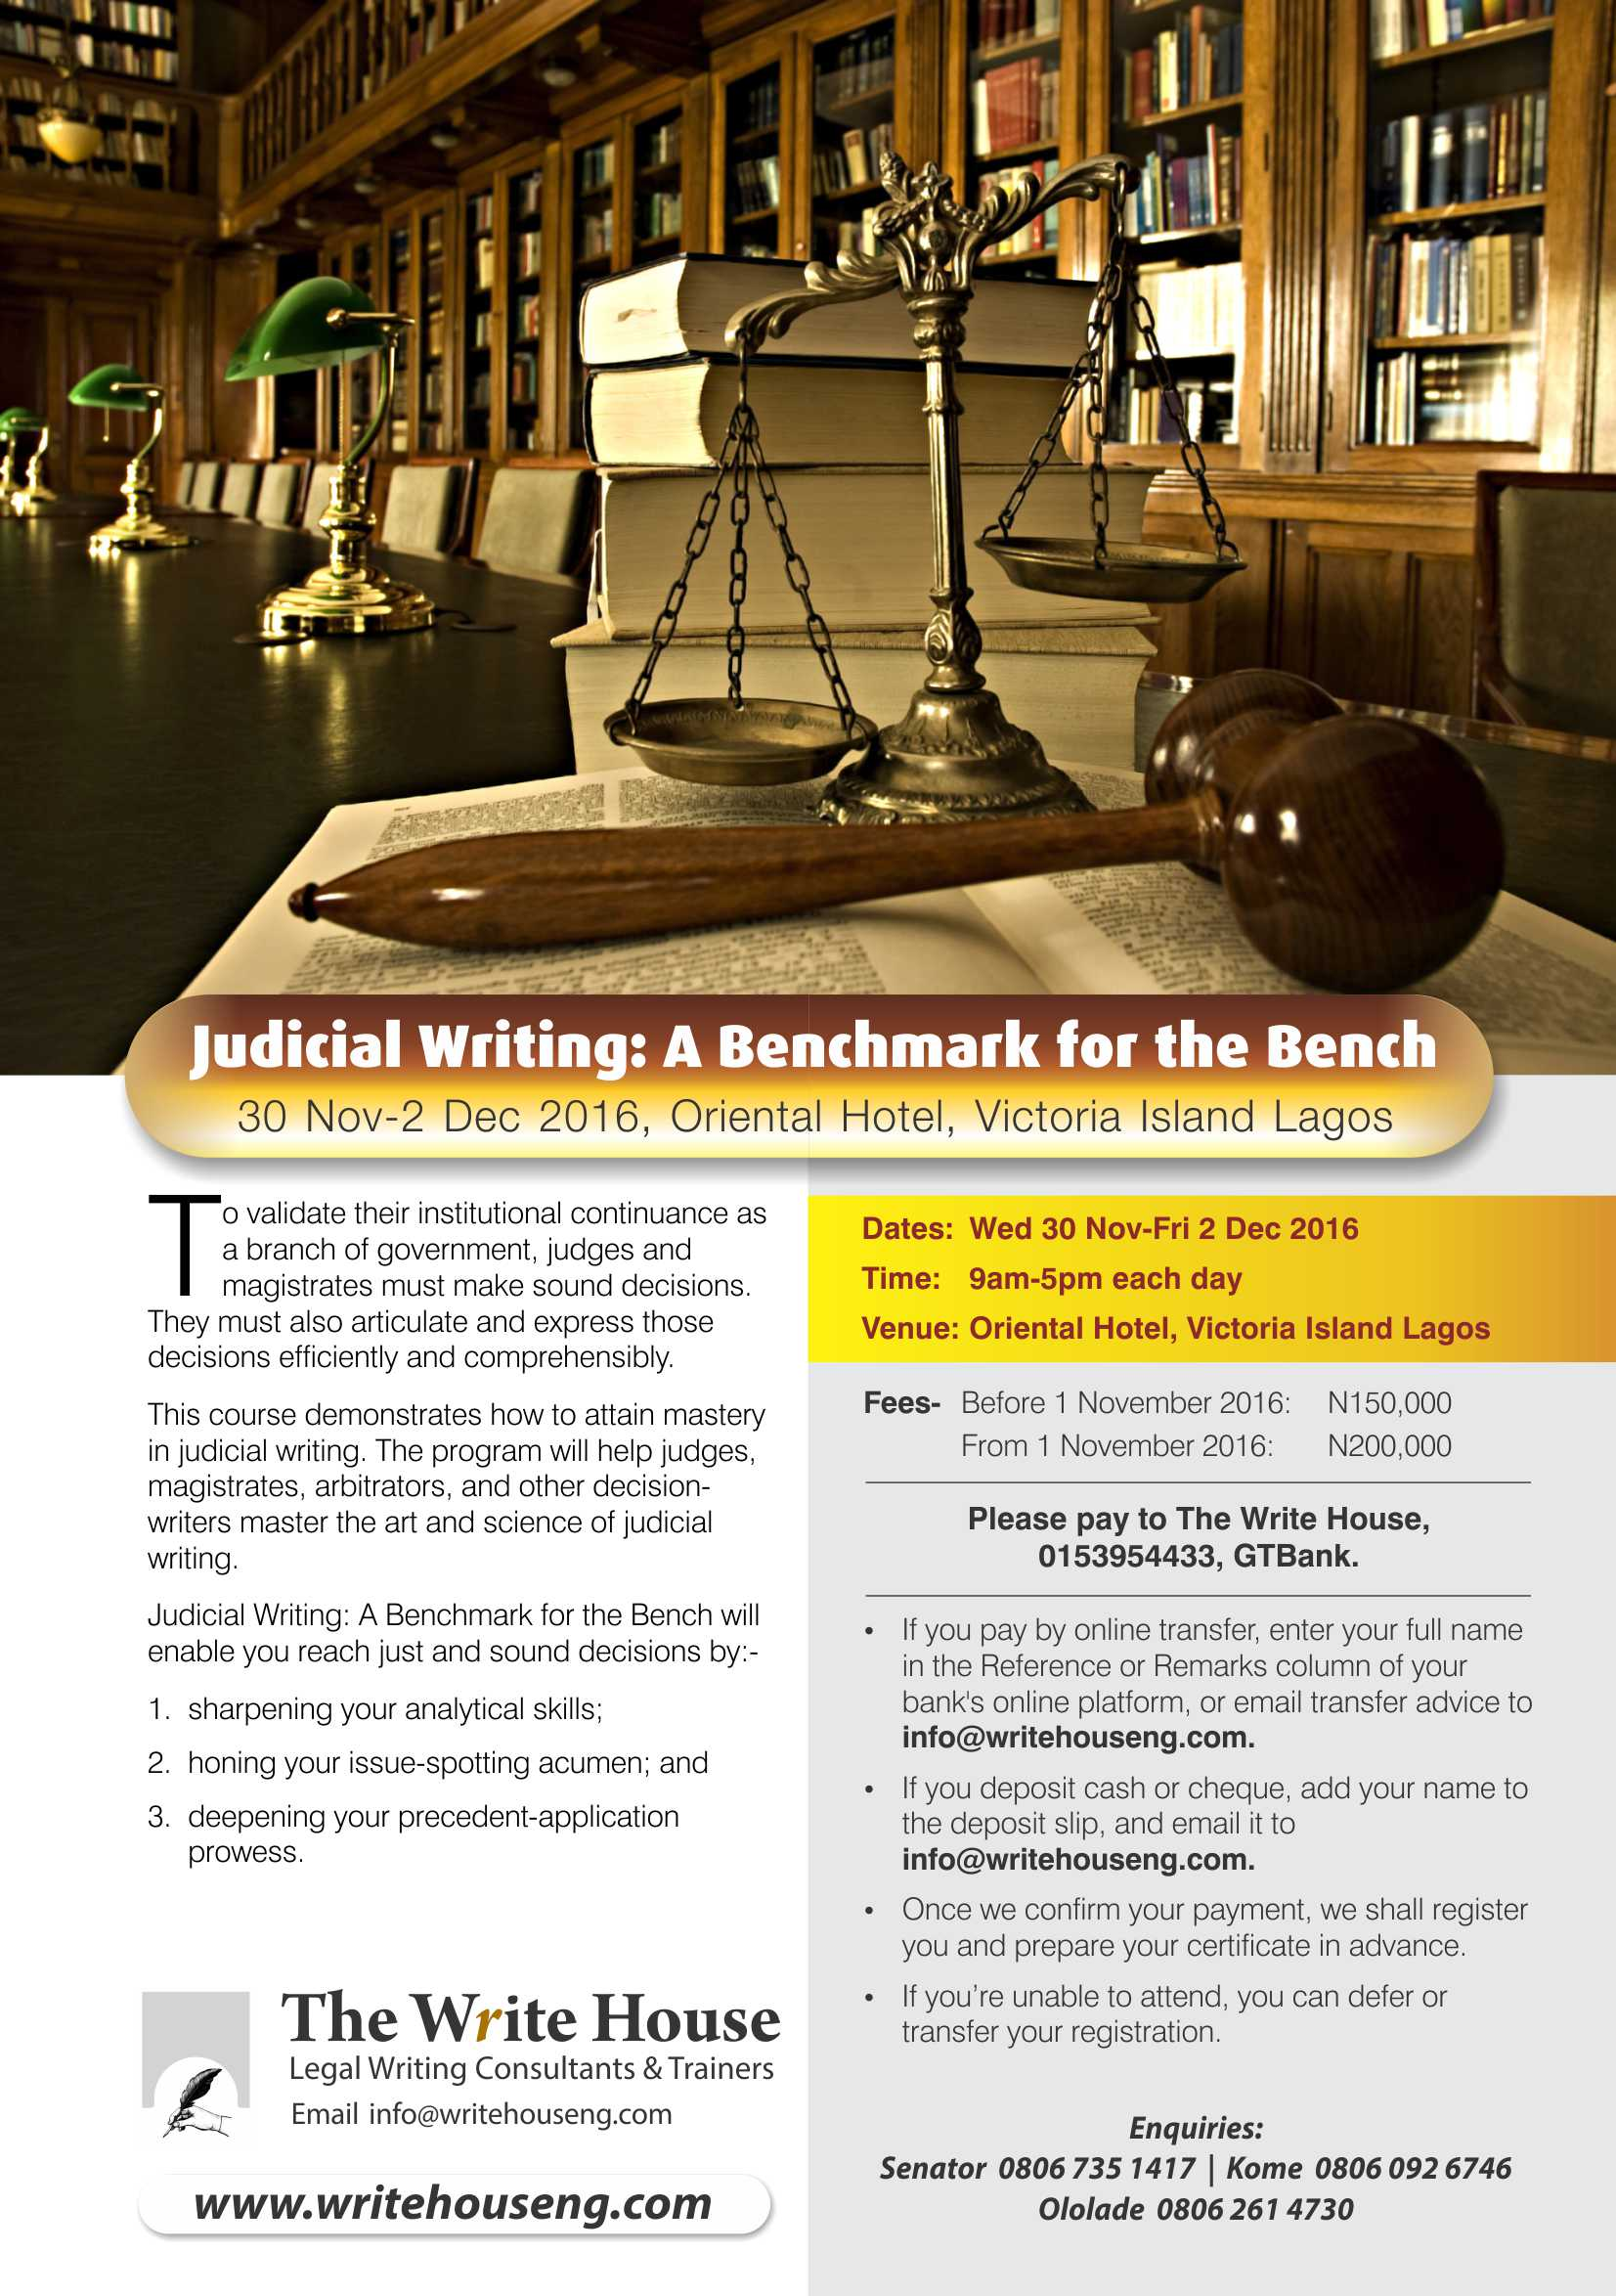 Judicial Writing: A Benchmark for the Bench, 30 Nov-2 Dec 2016, Victoria Island Lagos